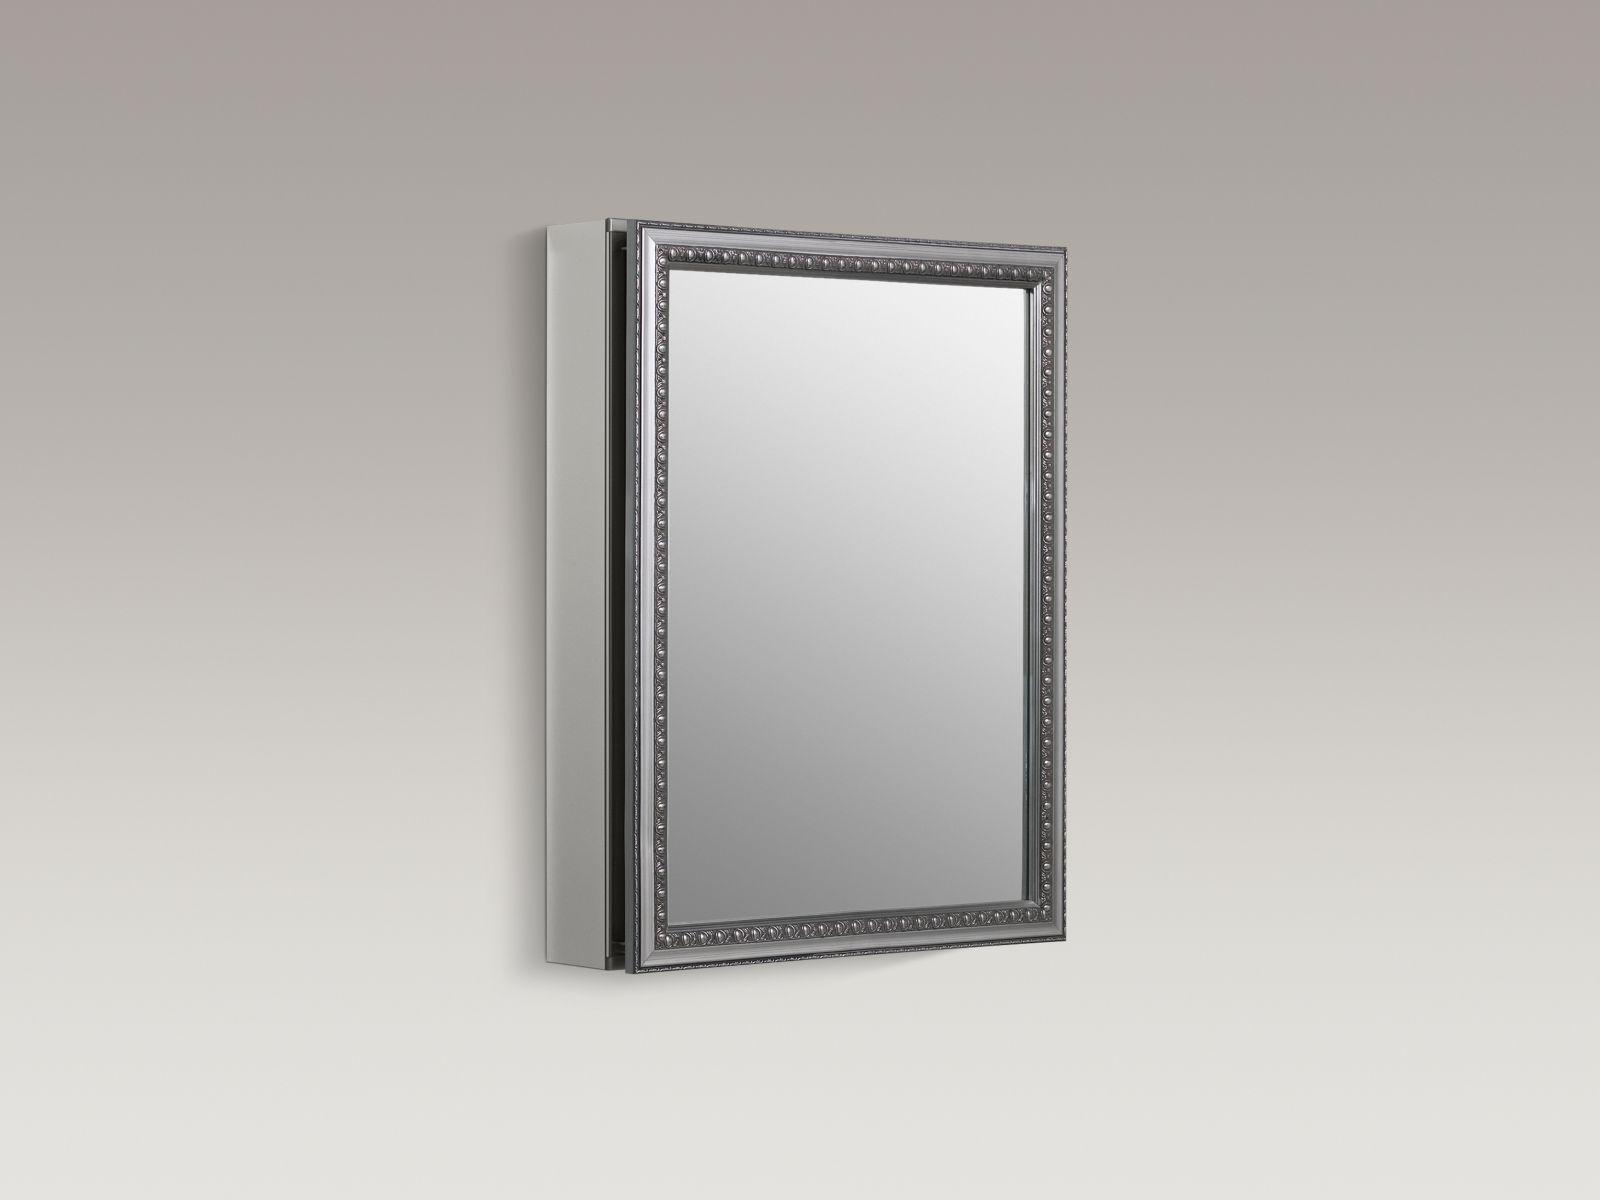 "Kohler K-CB-CLW2026SS Aluminum 20"" x 26"" Single-door Medicine Cabinet with Decorative Silver Framed Mirrored Door"